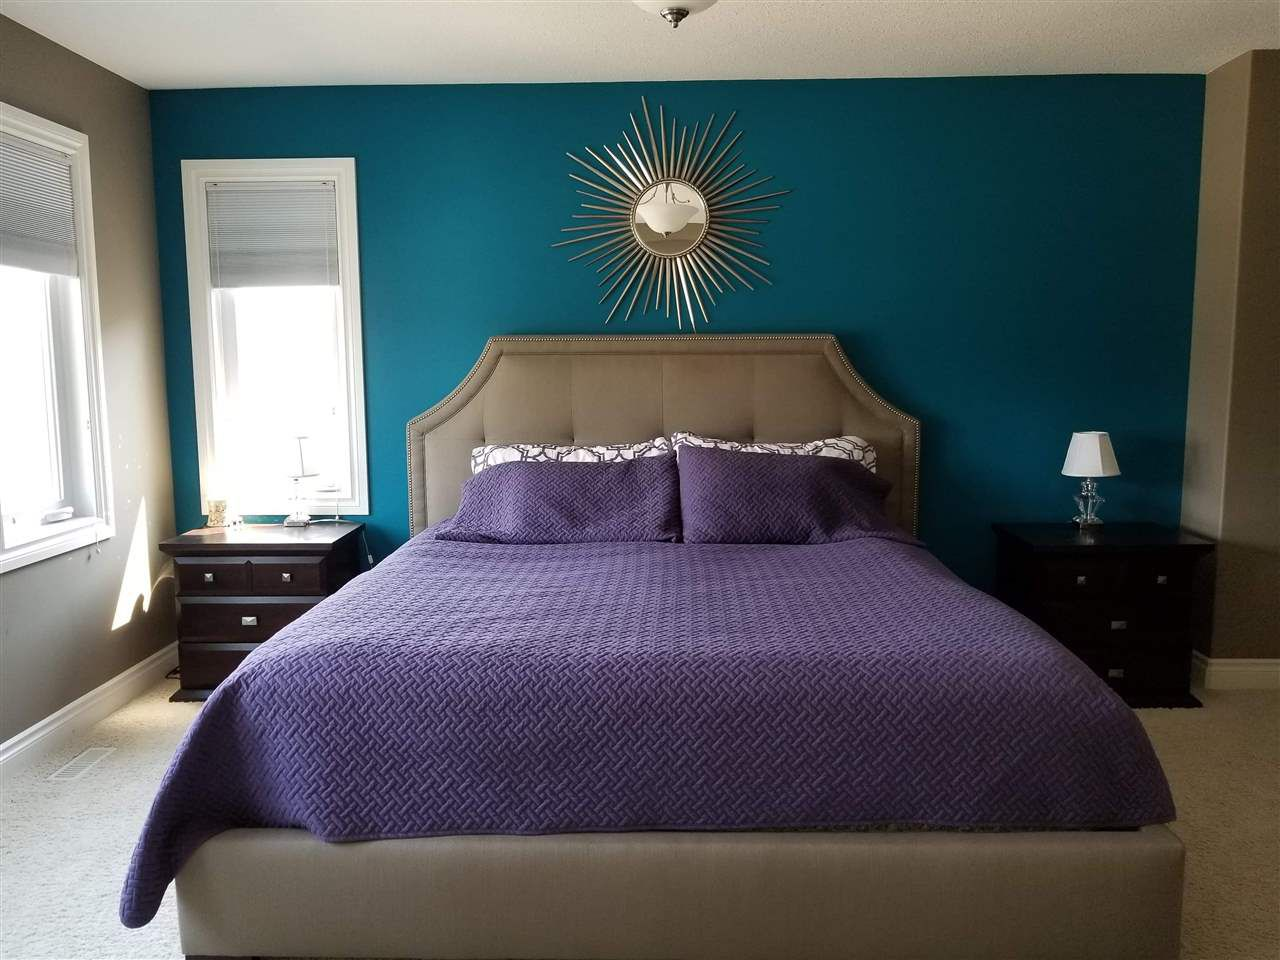 Photo 15: Photos: 5428 EDWORTHY Way in Edmonton: Zone 57 House for sale : MLS®# E4145439